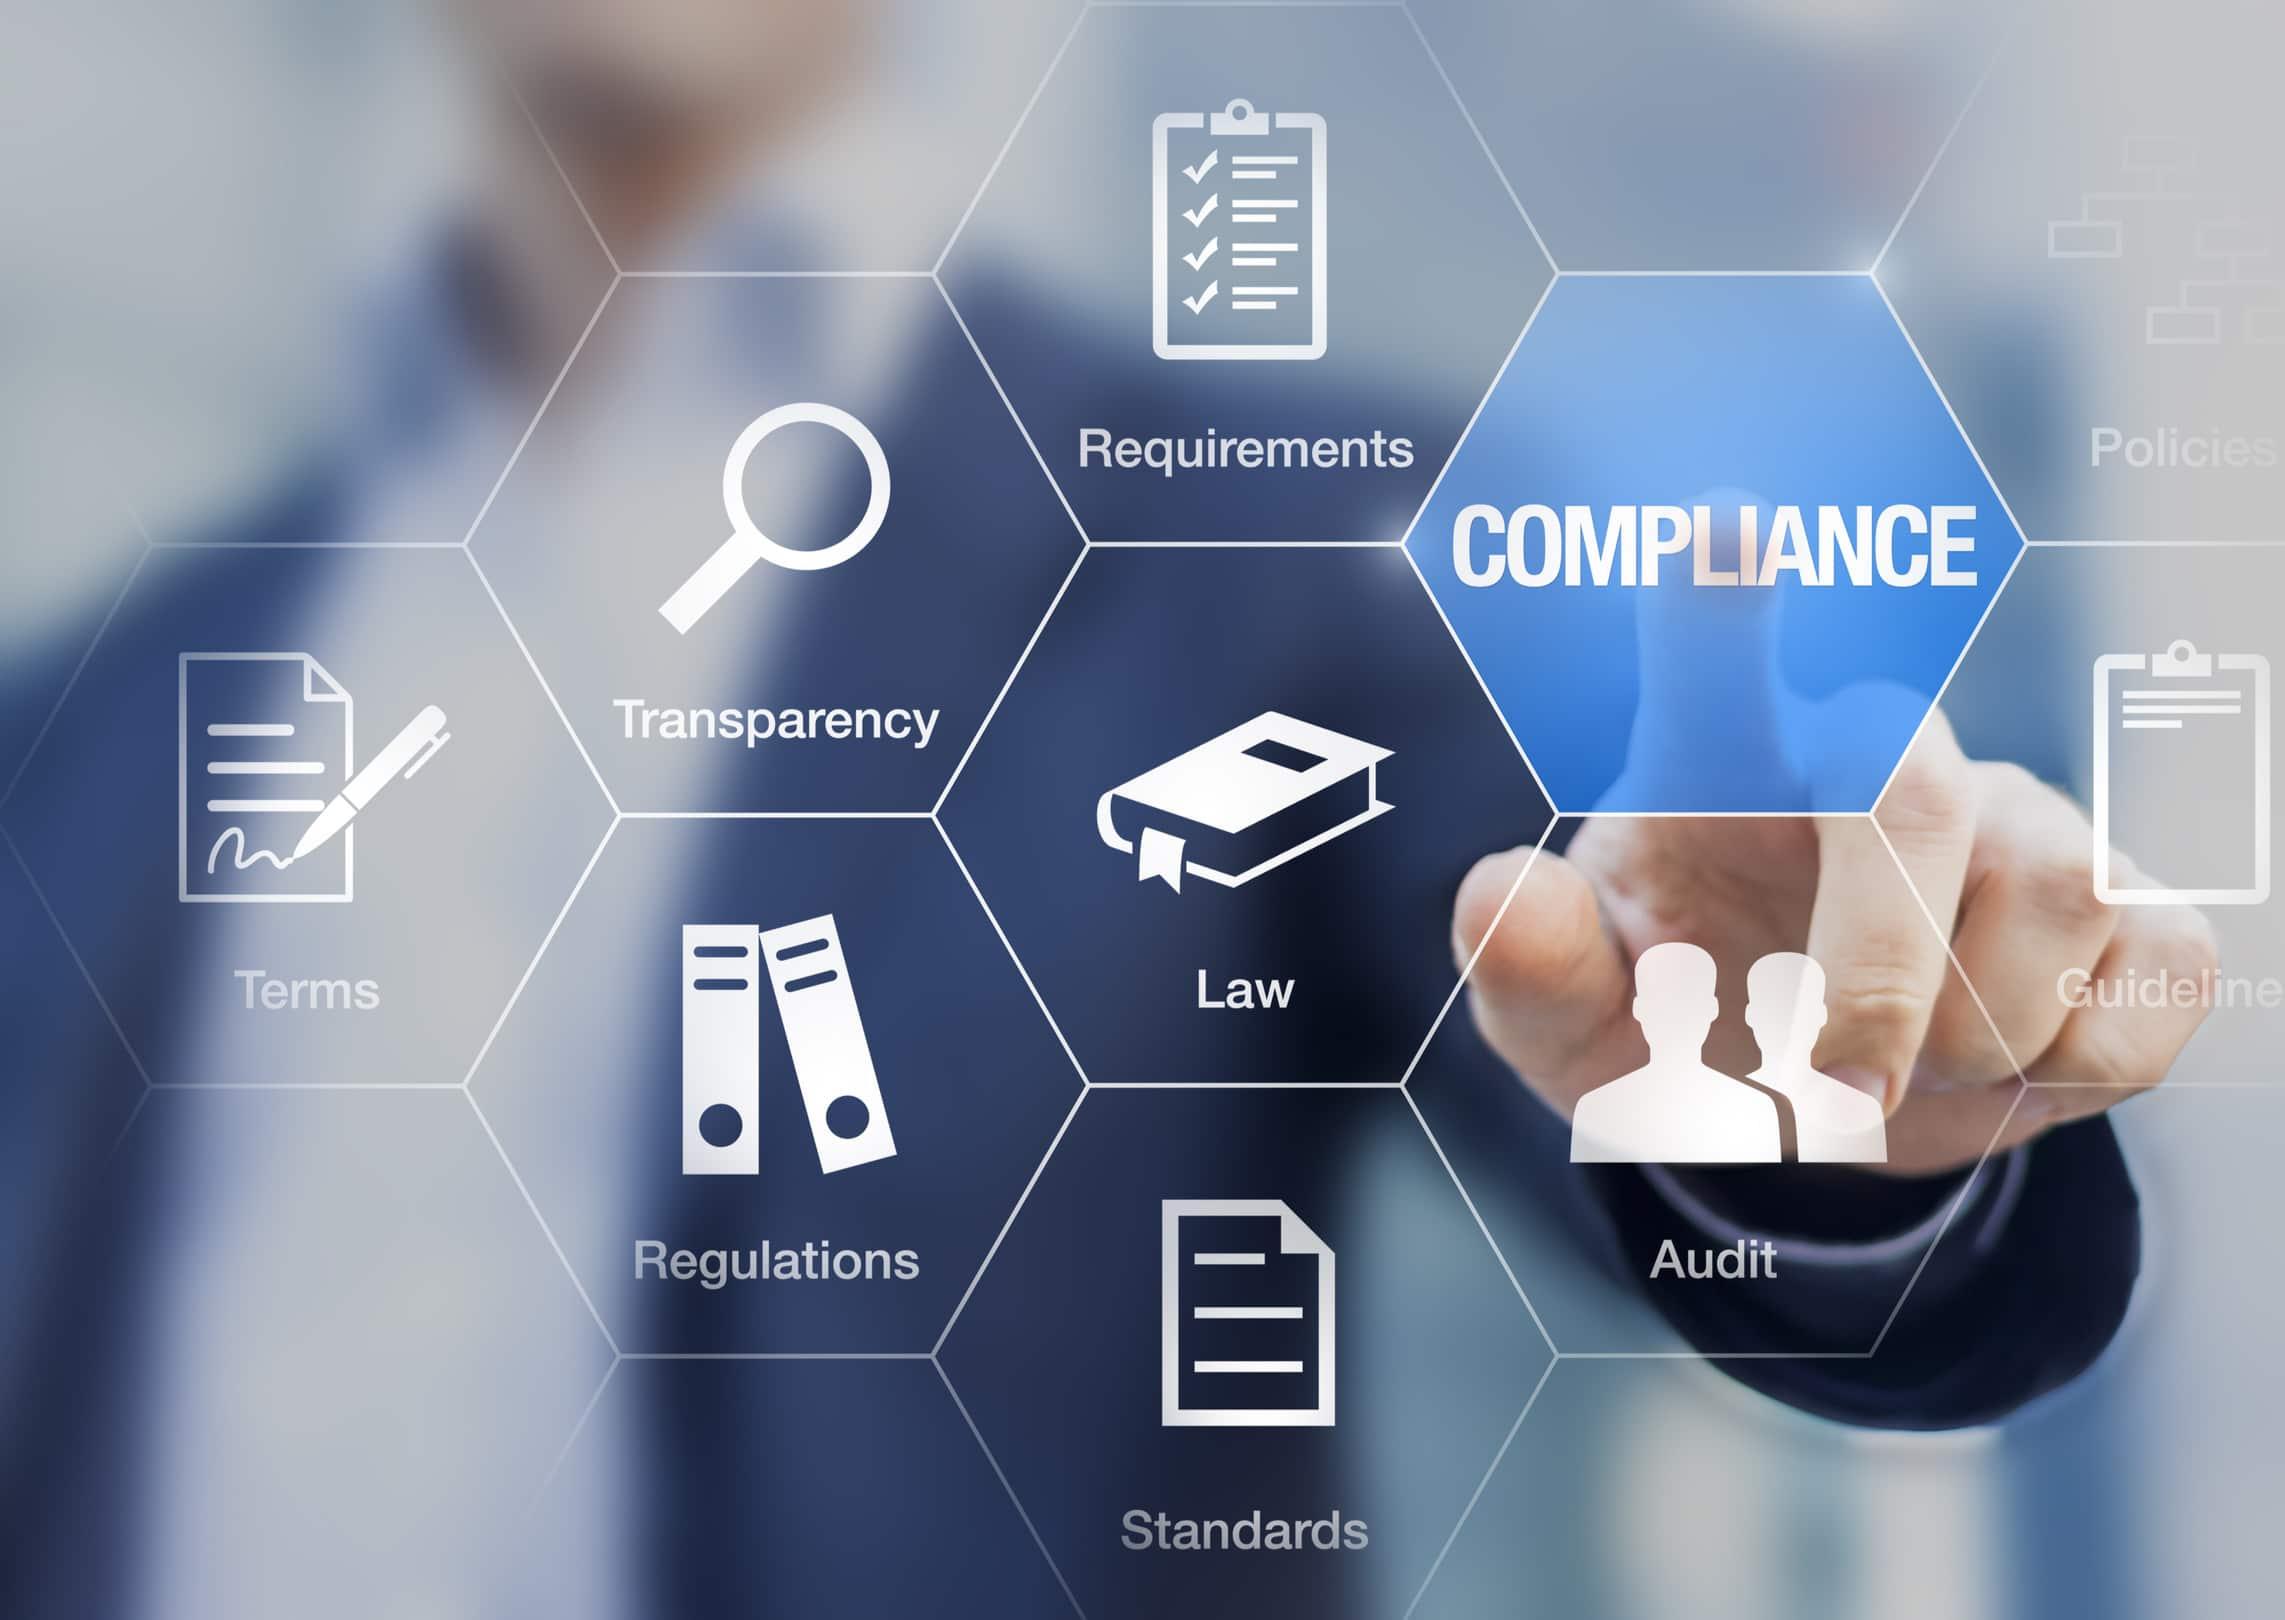 Enterprise Governance, Risk And Compliance Software